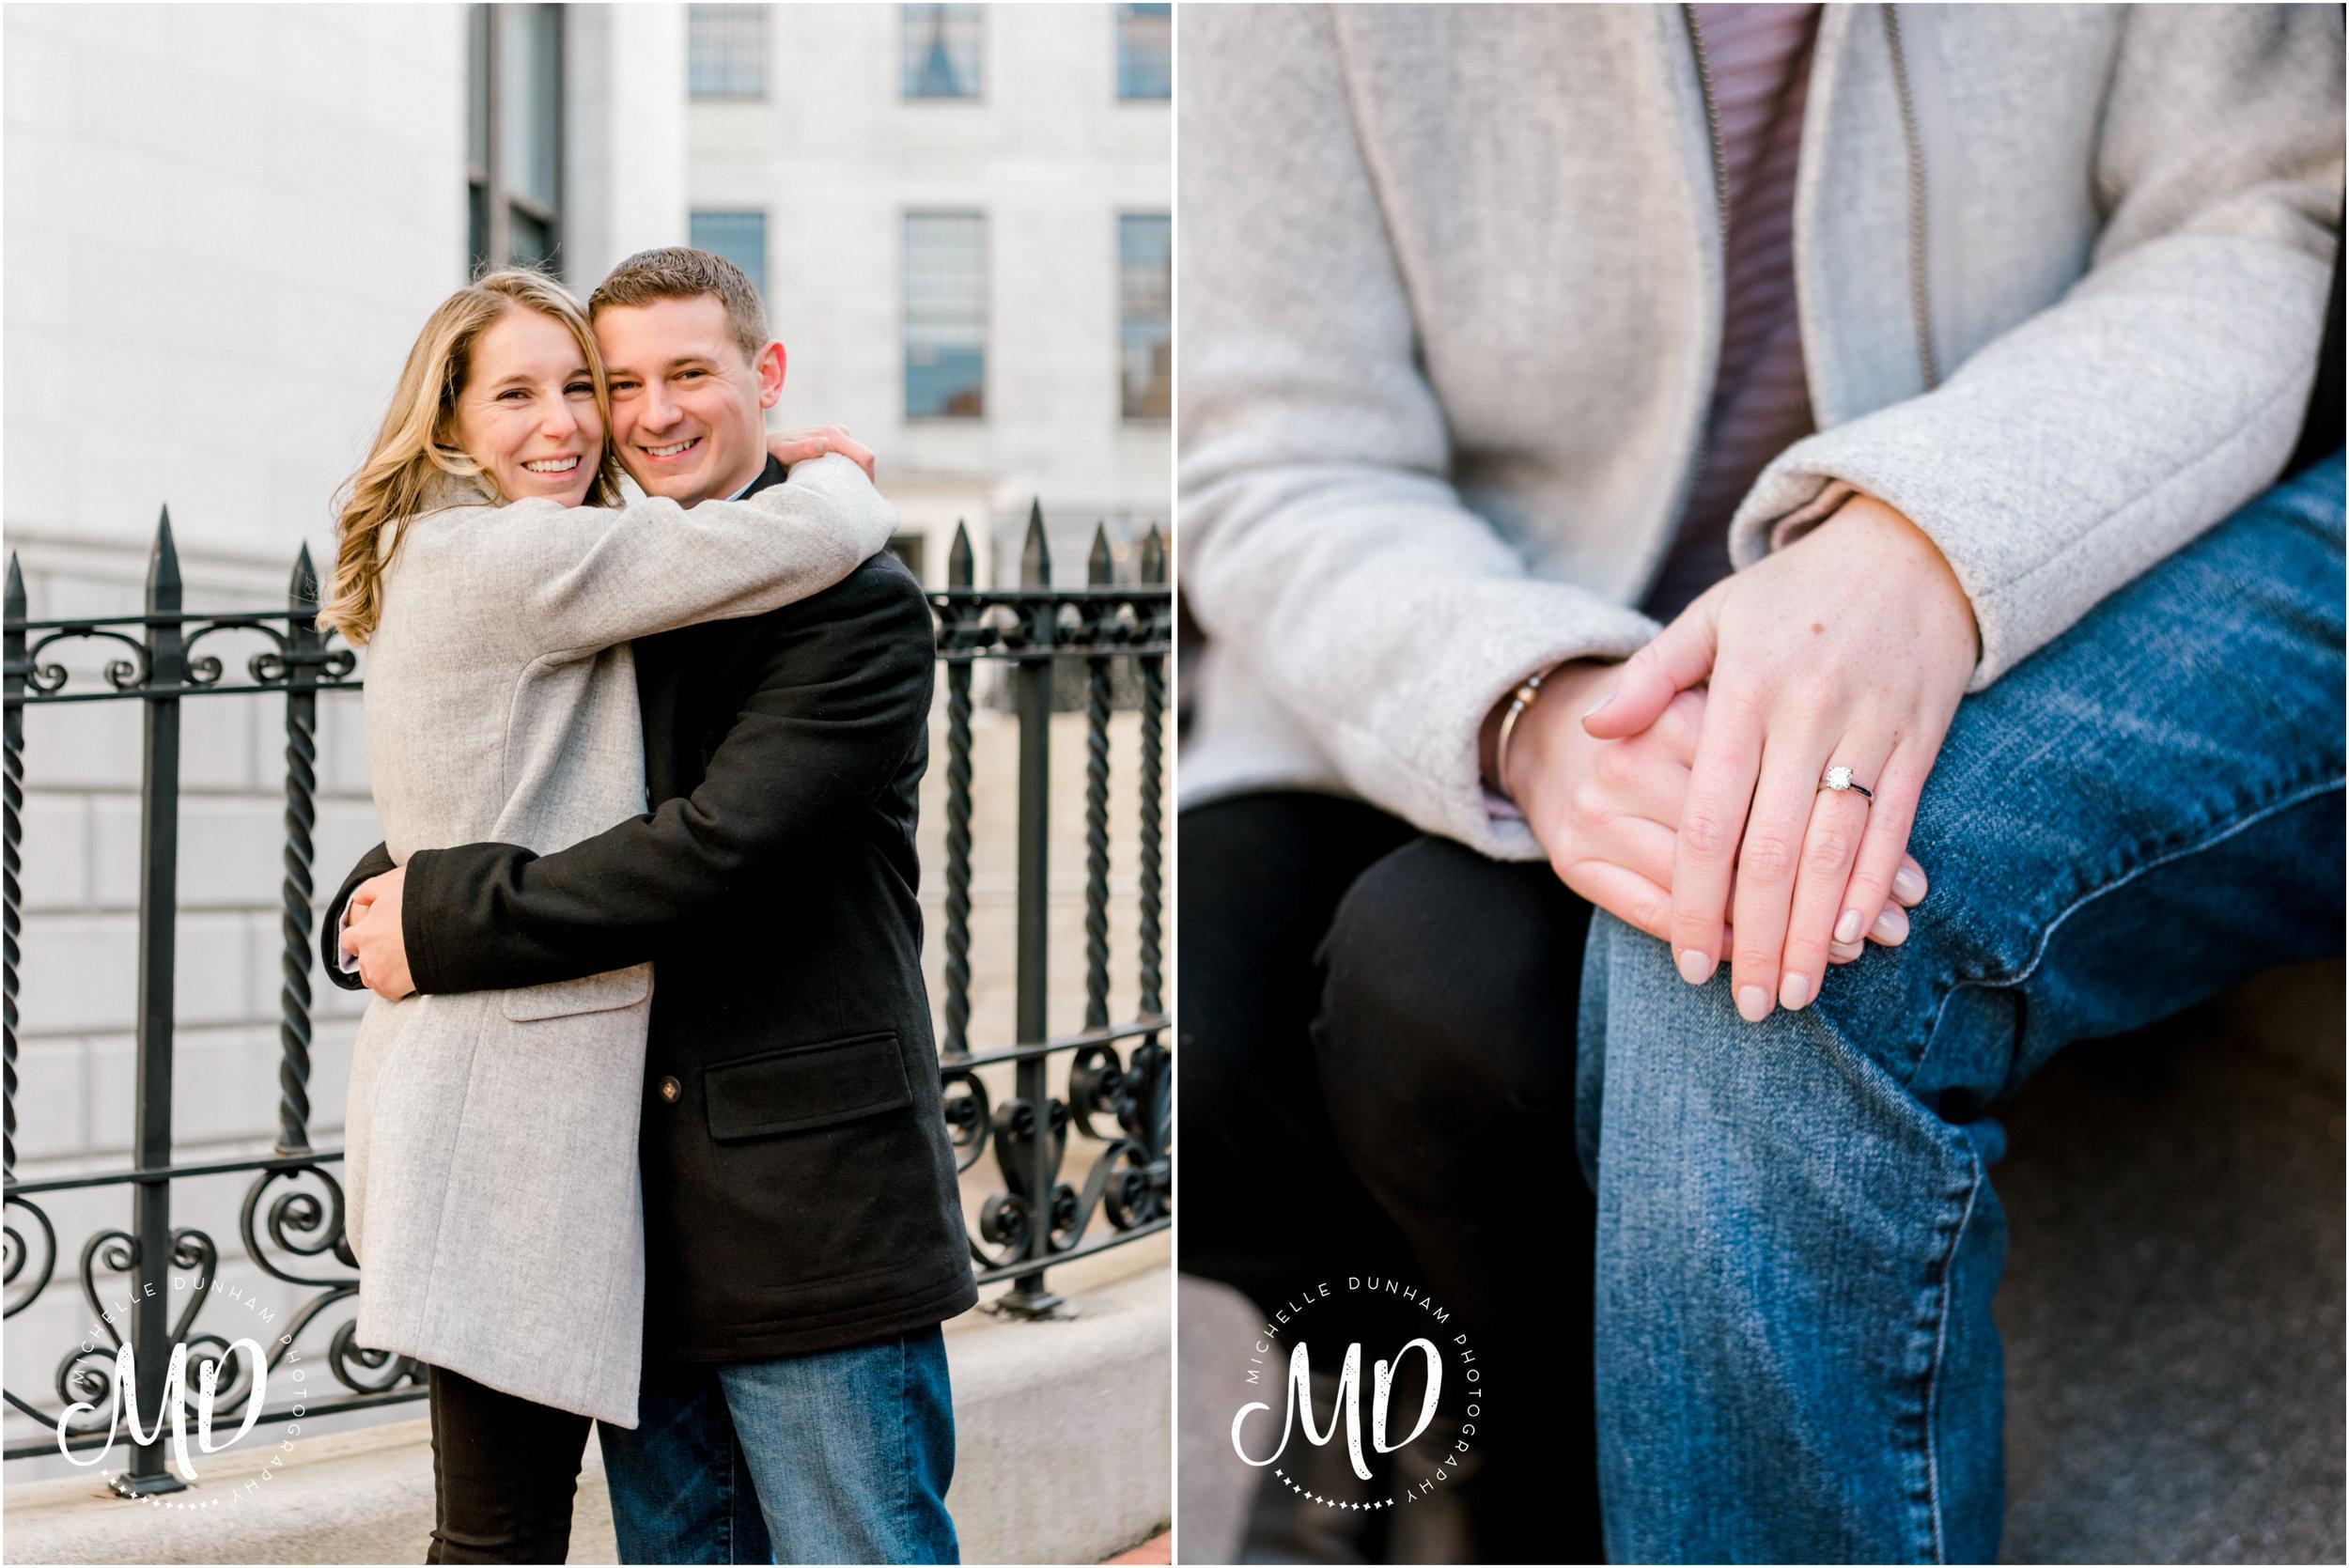 Michelle-Dunham-Photography-Beacon-Hill-Engagement-17.jpg